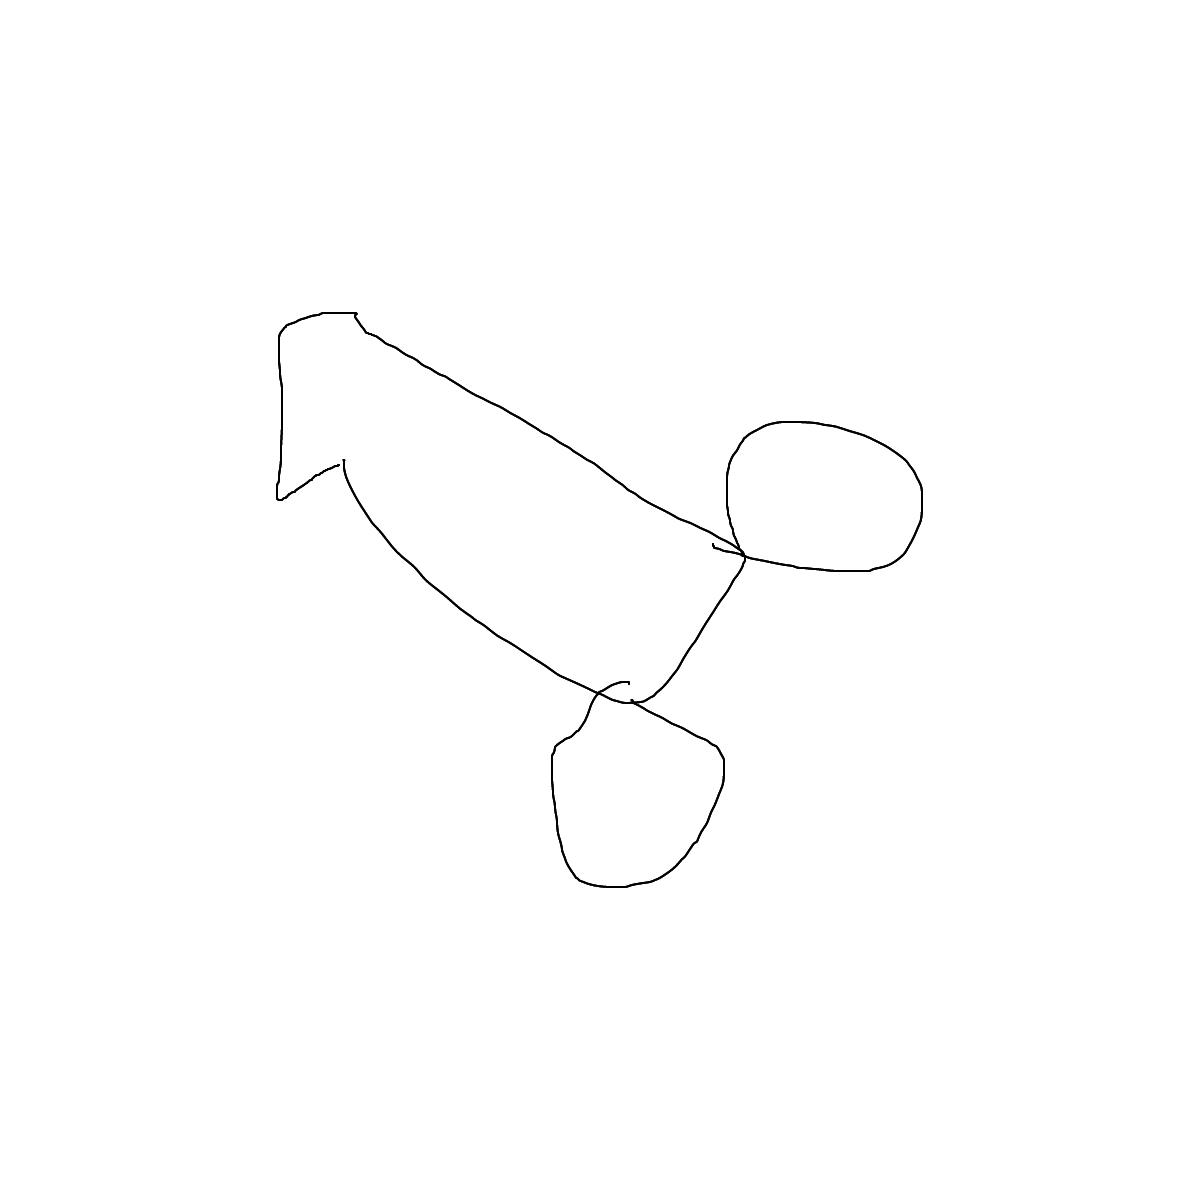 BAAAM drawing#6793 lat:41.7363510131835940lng: -6.5795230865478520